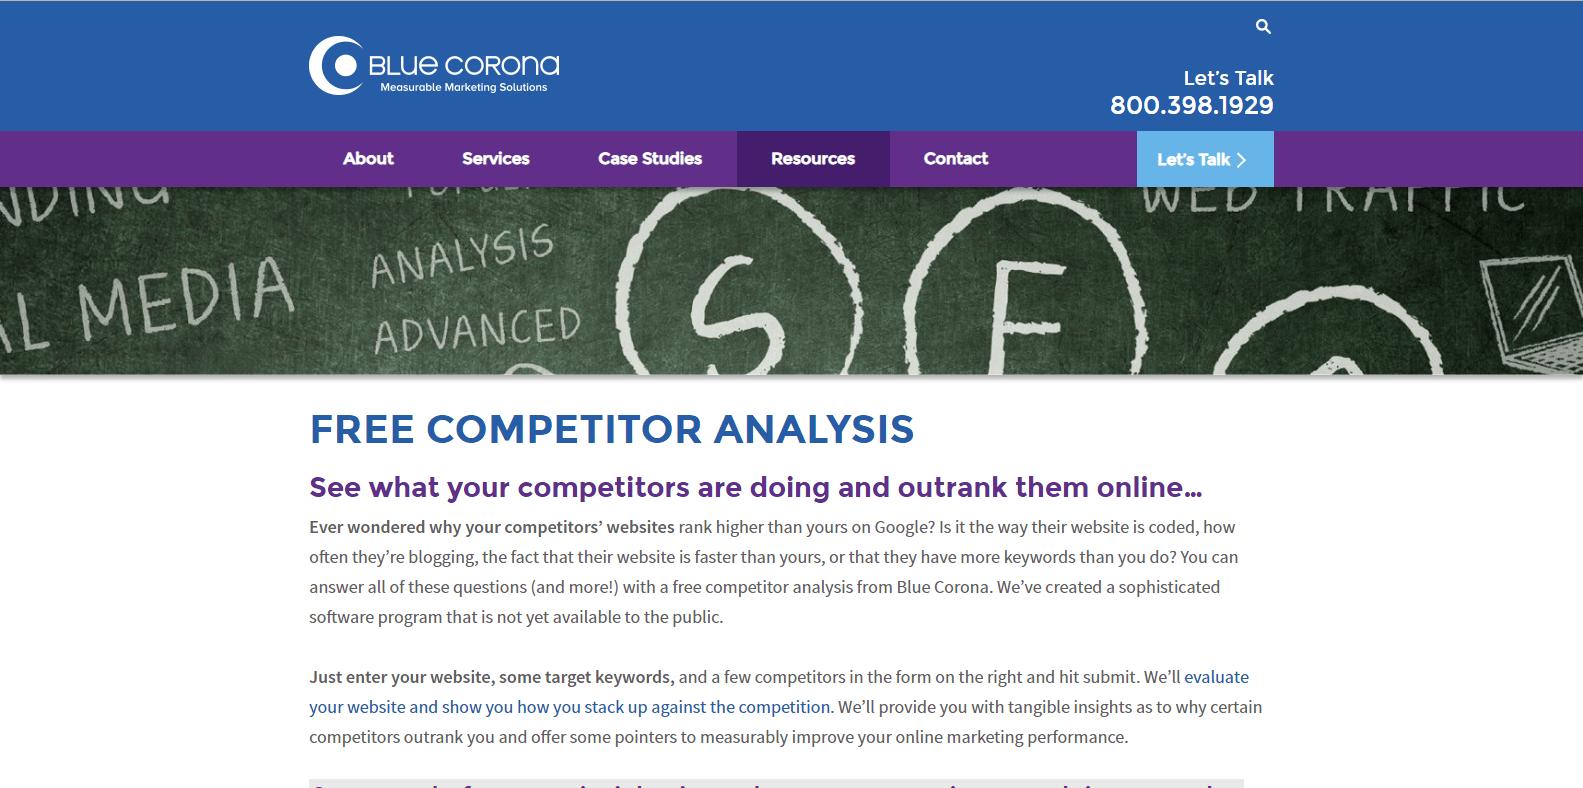 Blue Corona Competitor Analysis Tools